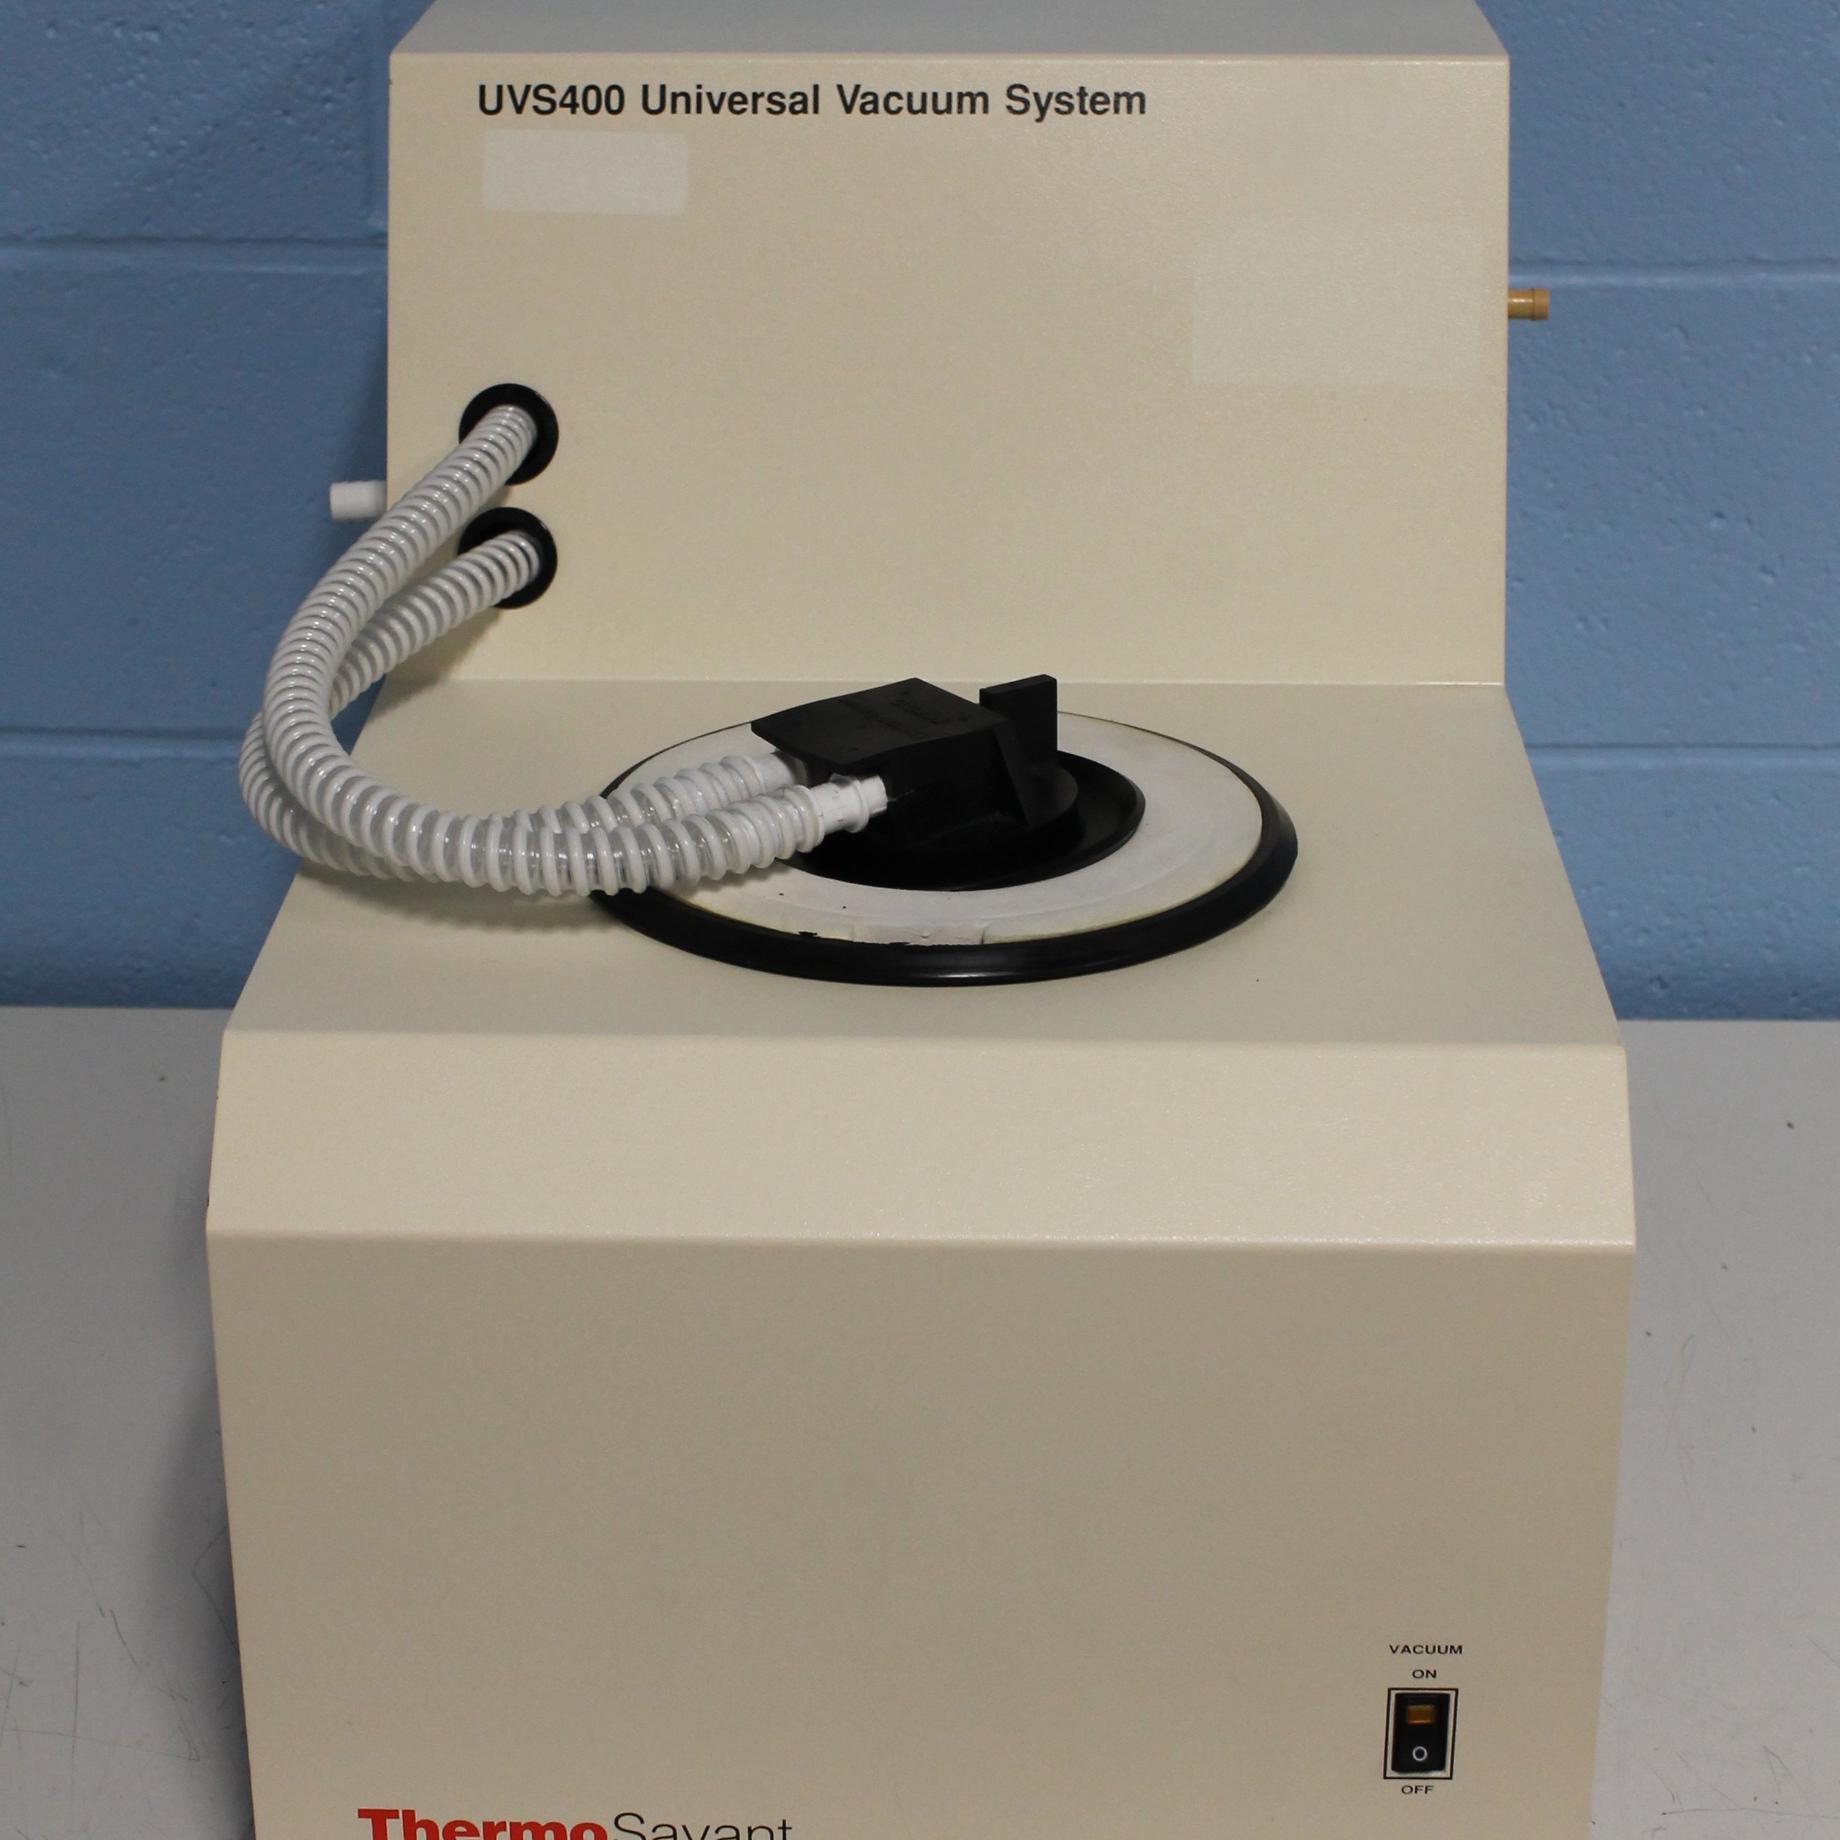 UVS400-115 Universal Vacuum System Name